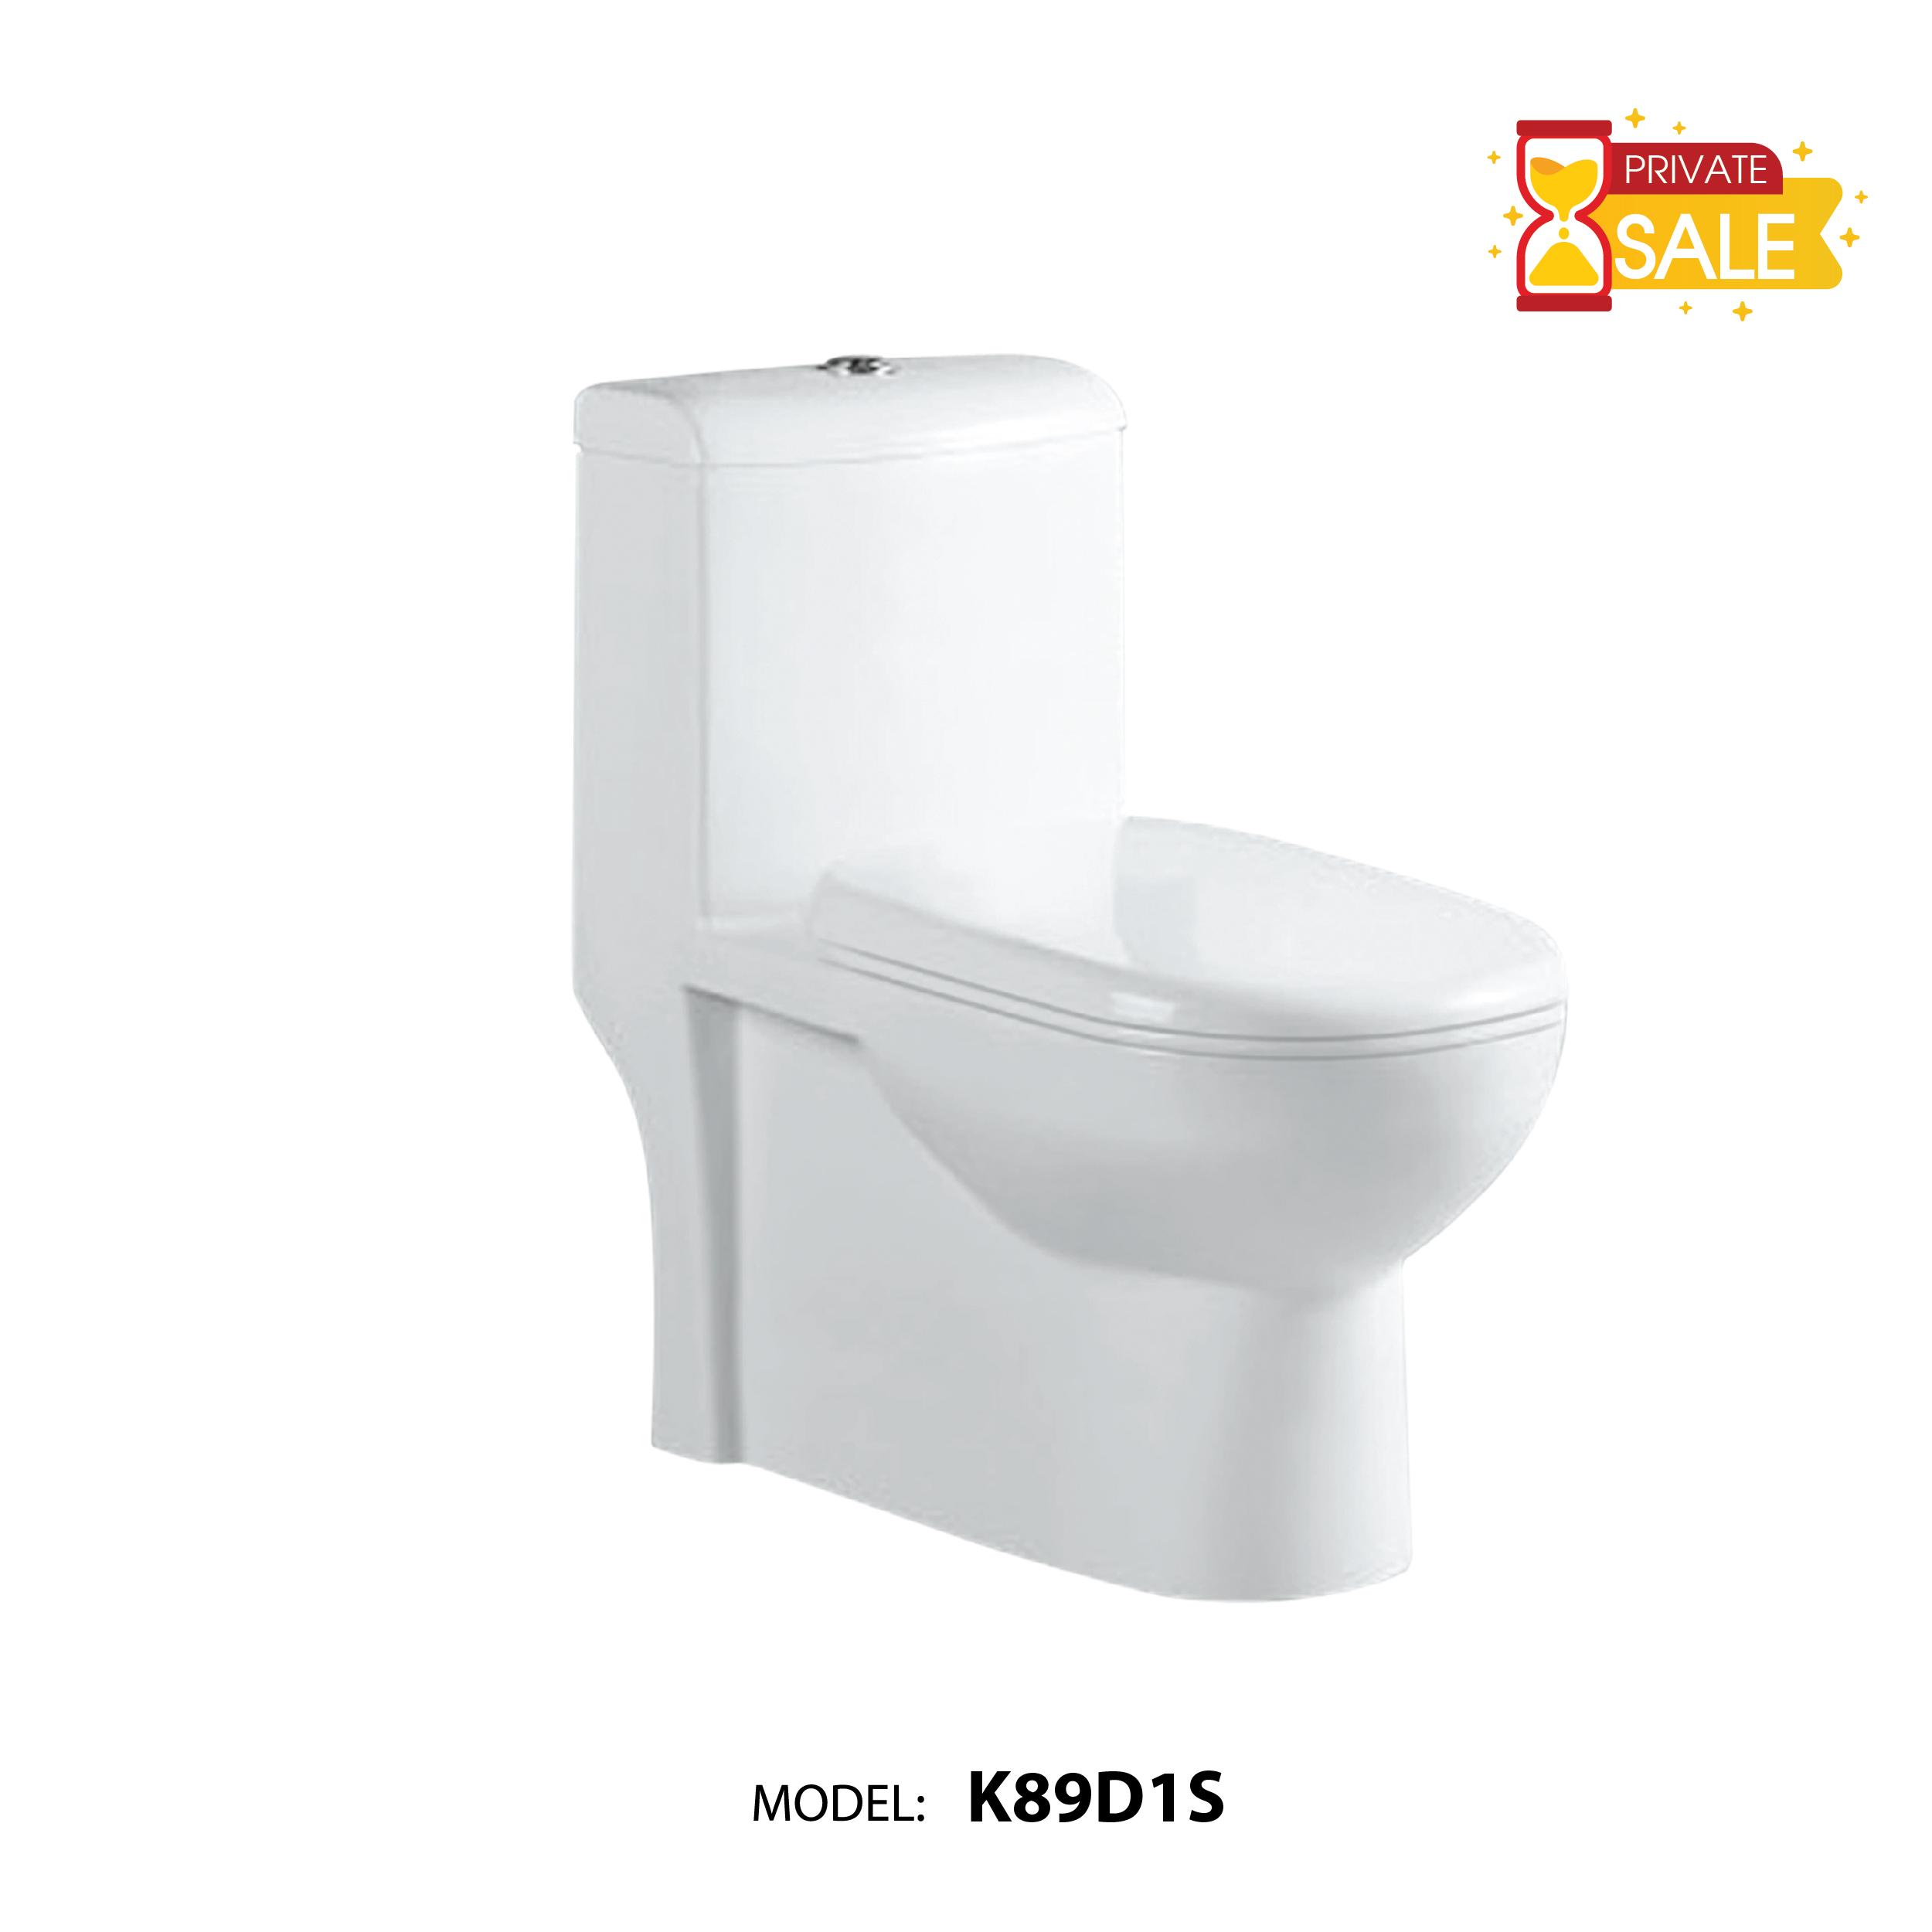 BỒN CẦU CARANO 1 KHỐI K89D1S ( TOILET MODEL: K89D1S )